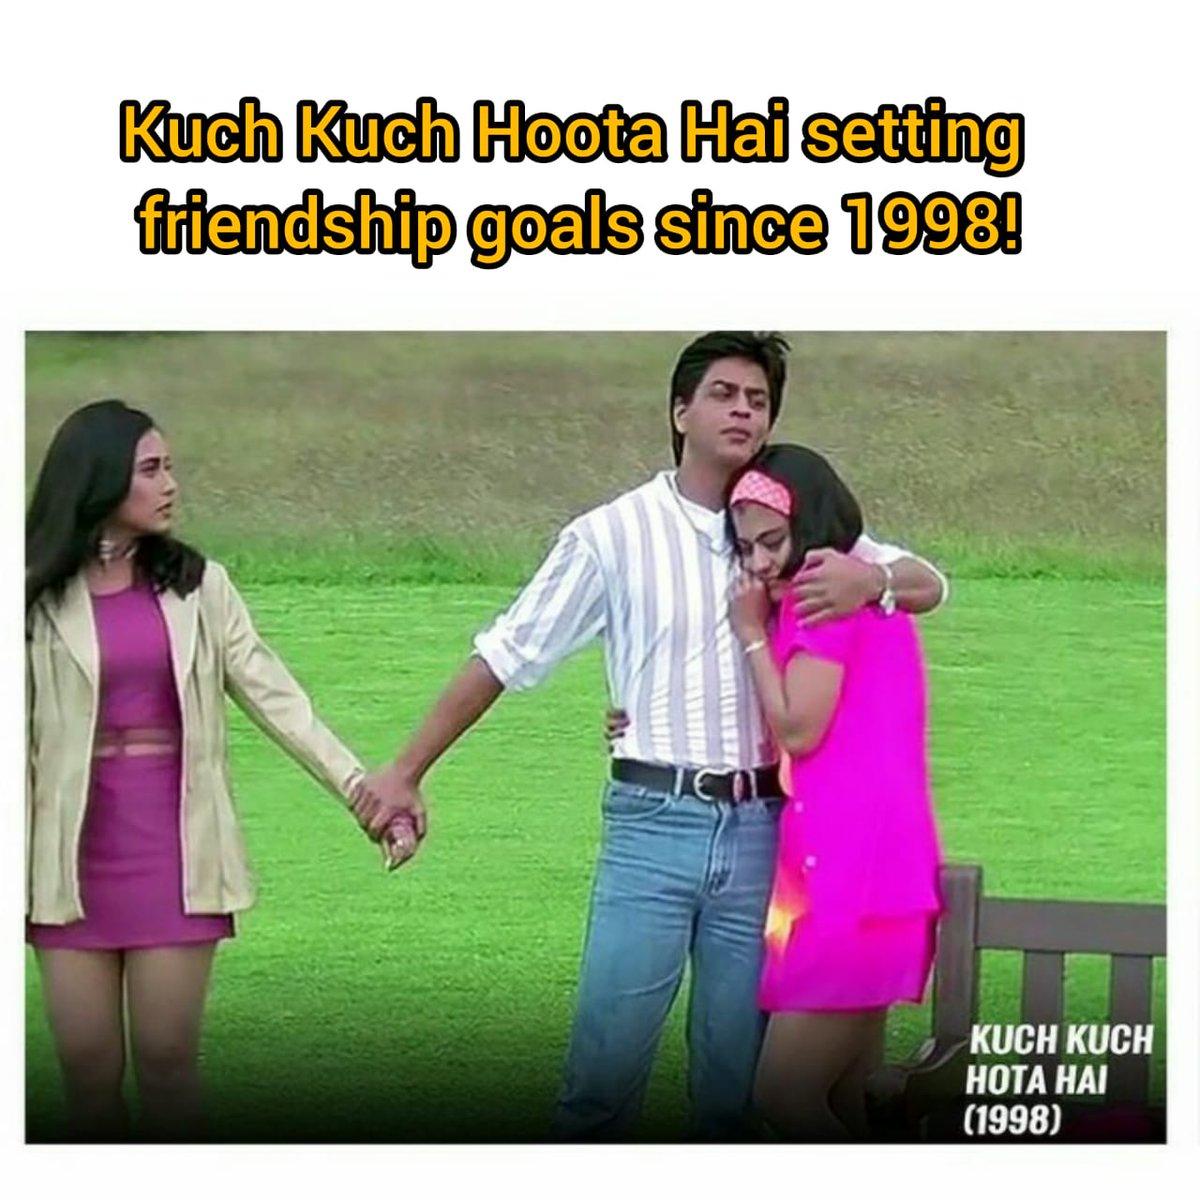 Kuch kuch hota hai since 1998!🤪 #KaranJohar #DharmaProductions #Bollywood #KuchKuchHotaHai #BestMovies #BollywoodMovies #Entertainment #BestFilmMaker #BestDirector #BestMovie #Director https://t.co/PiyXEJvqtl